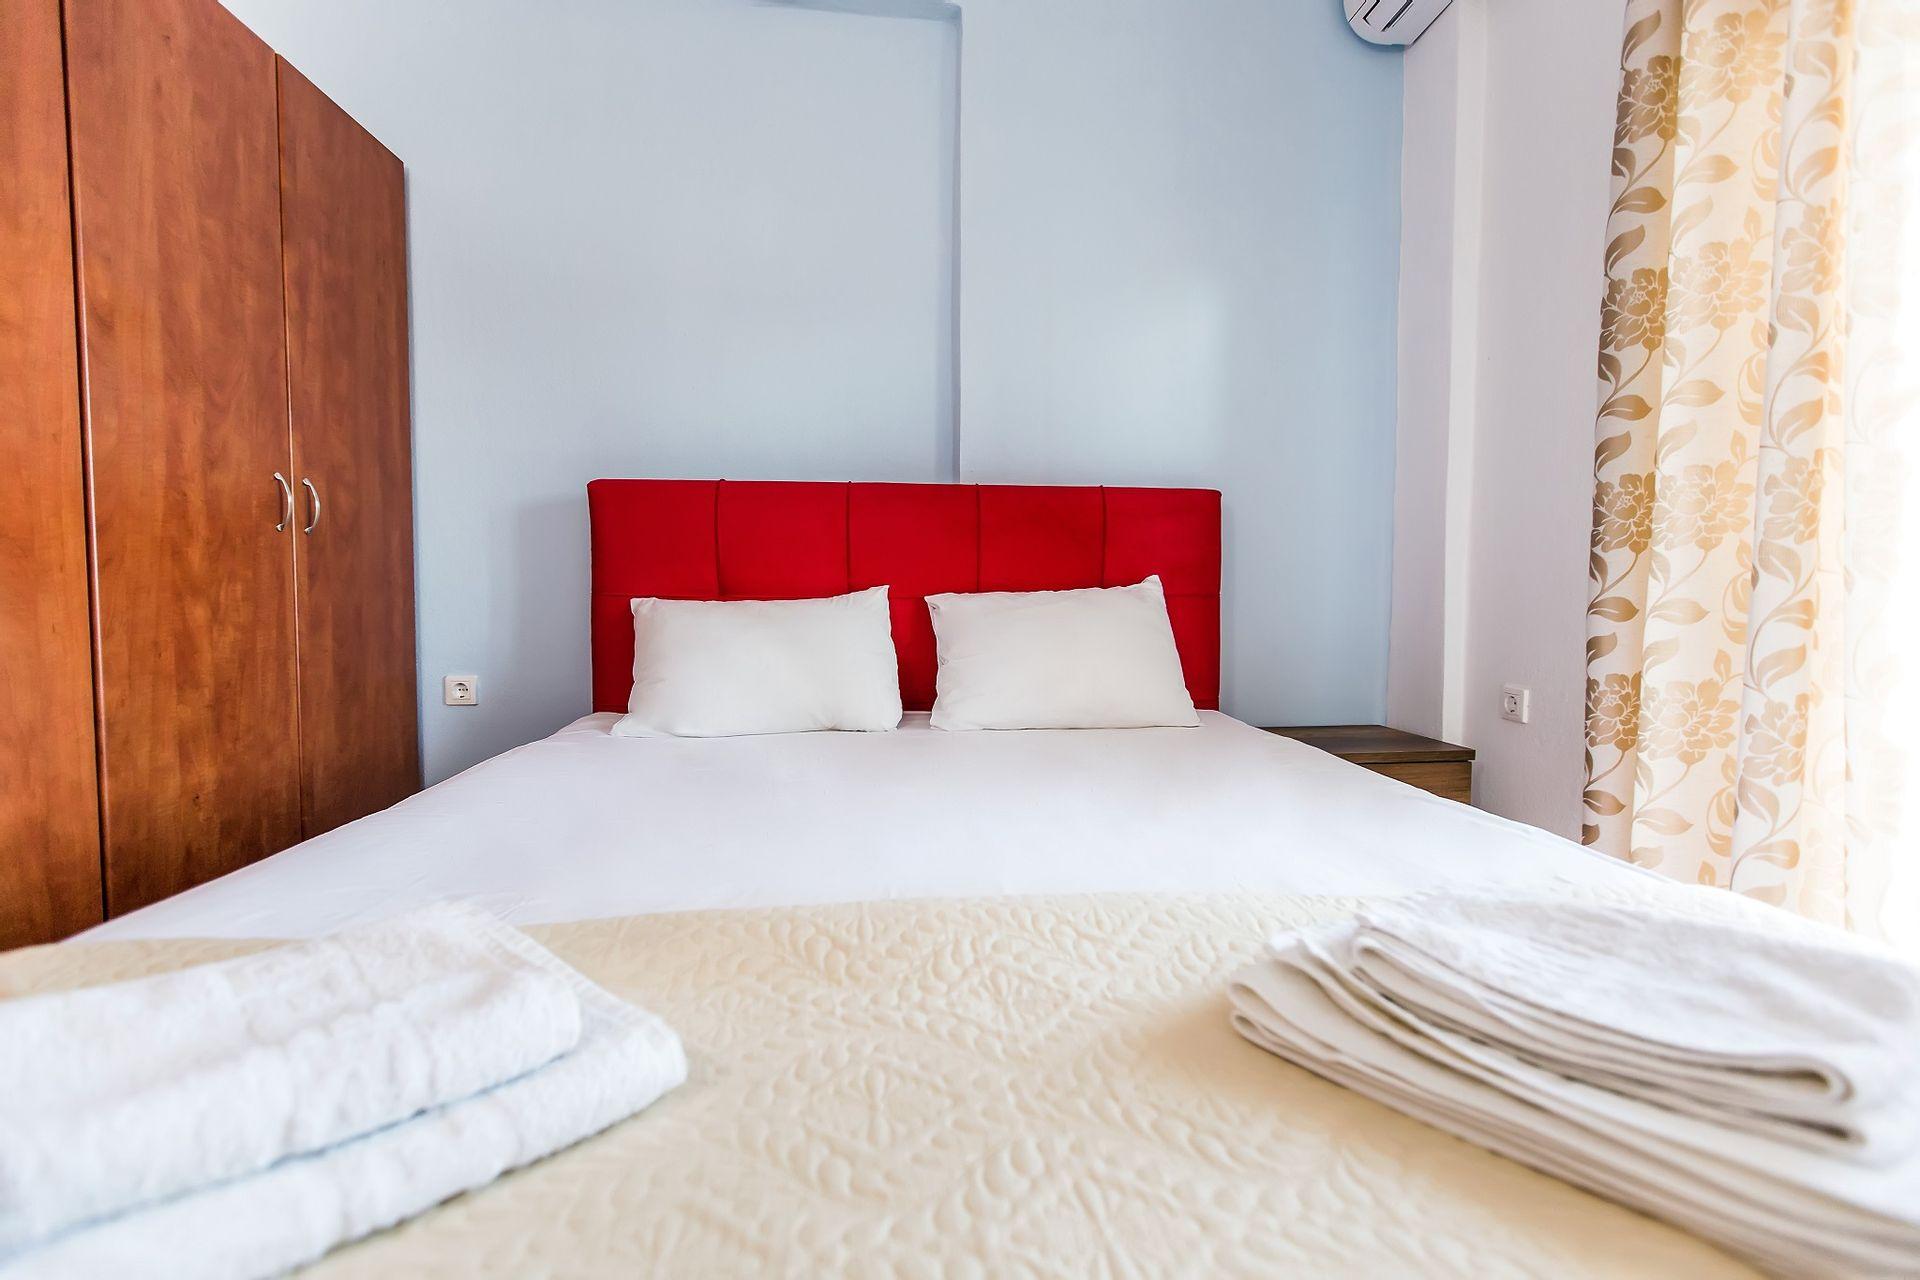 Greek Pride Villa Ellada - Παραλία Φούρκας, Χαλκιδική ✦ 4 Ημέρες (3 Διανυκτερεύσεις) ✦ 2 άτομα + 1 παιδί έως 11 ετών ✦ Χωρίς Πρωινό ✦ 01/07/2021 έως 31/07/2021 ✦ Μπροστά στην παραλία!